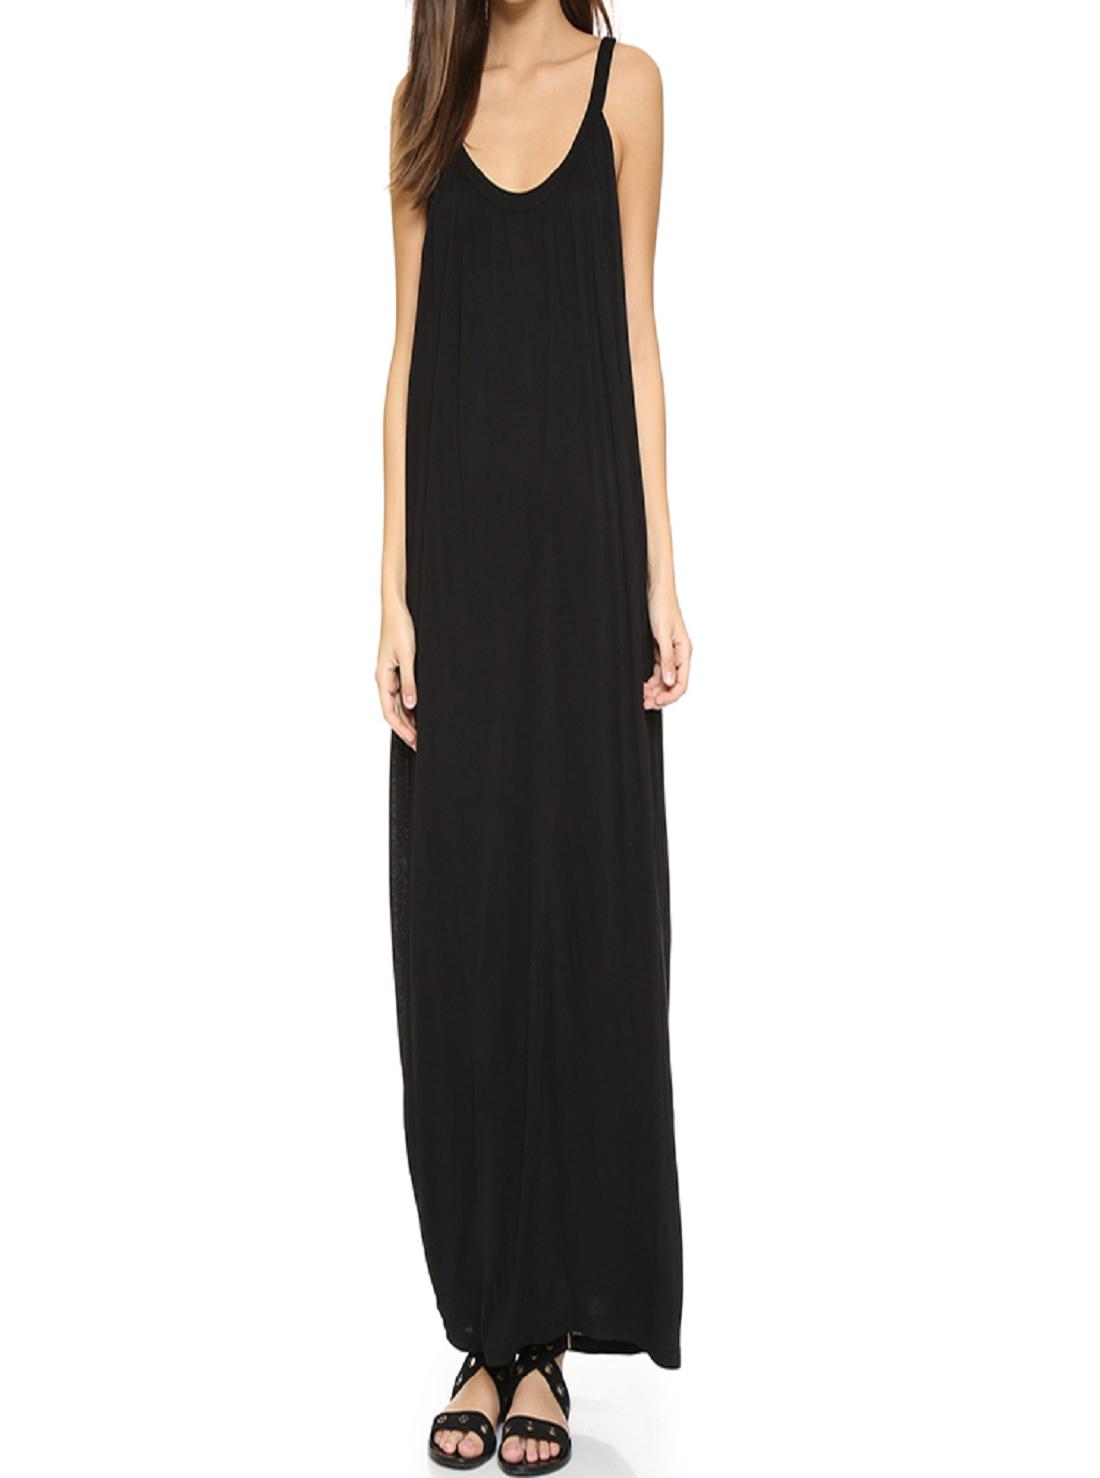 Wholesale Sleeveless Long Black Dress